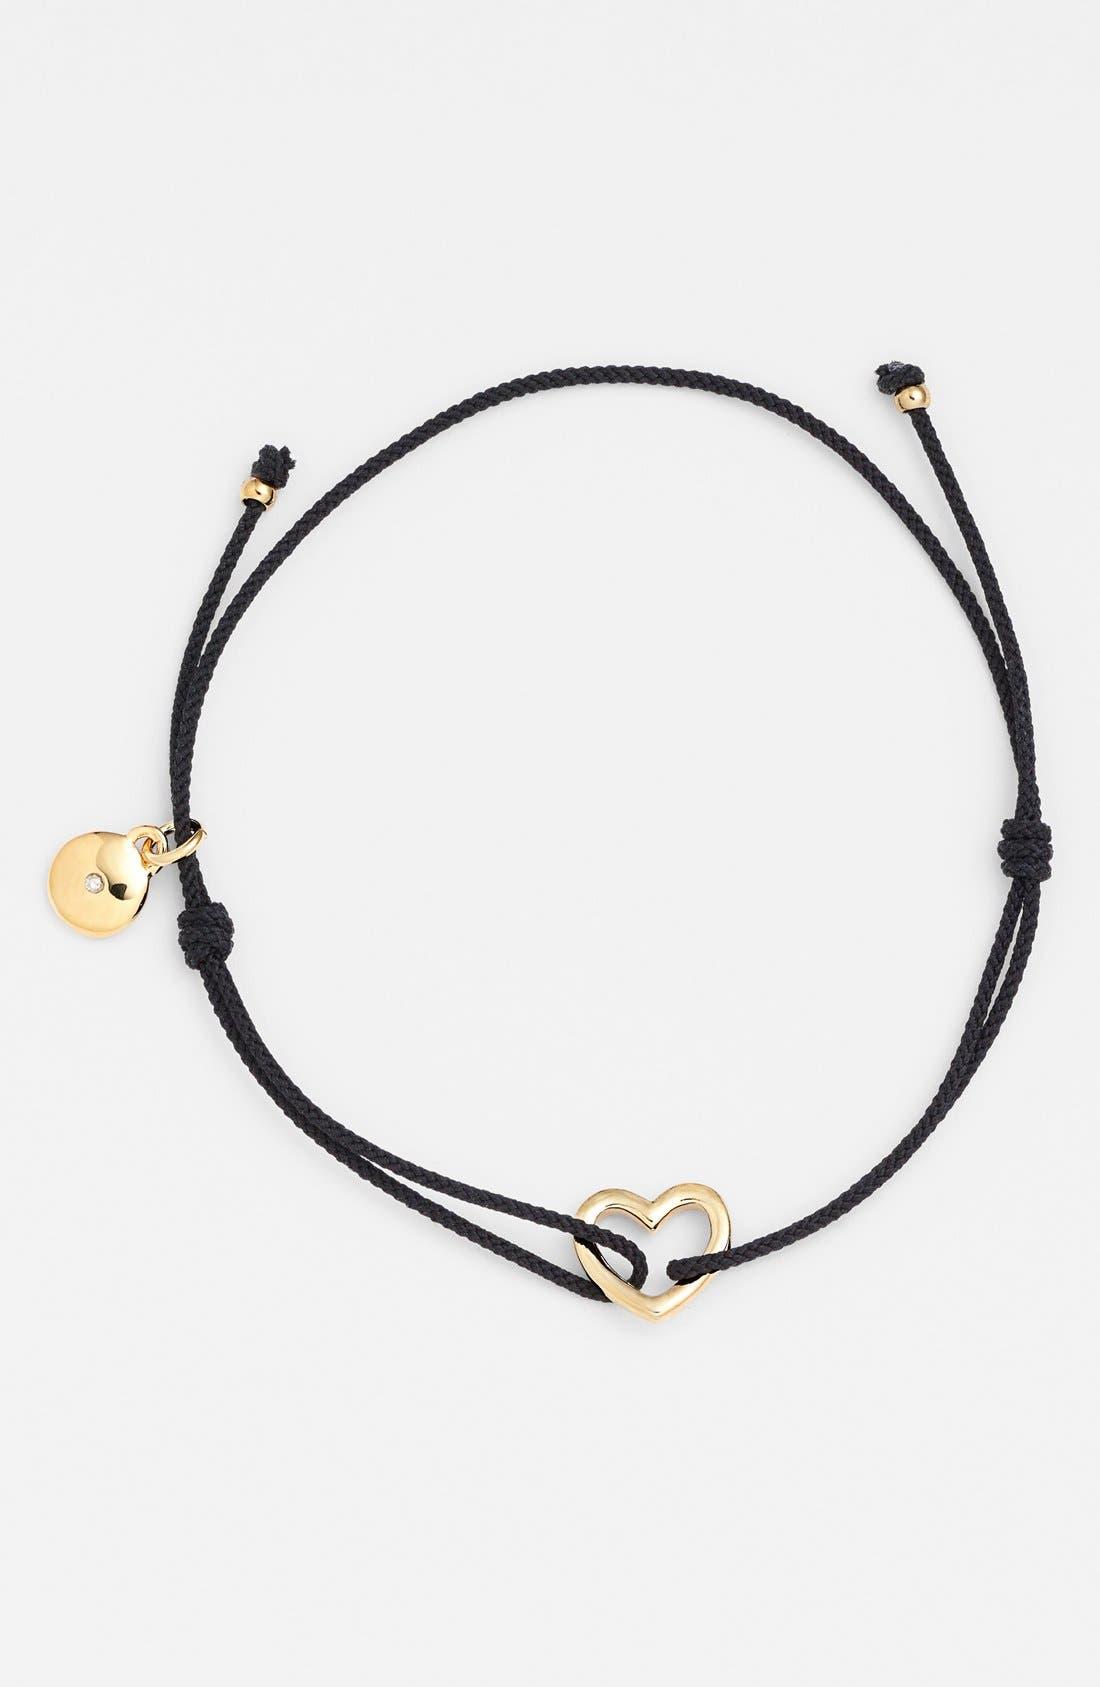 Main Image - MARC BY MARC JACOBS Heart Station Friendship Bracelet